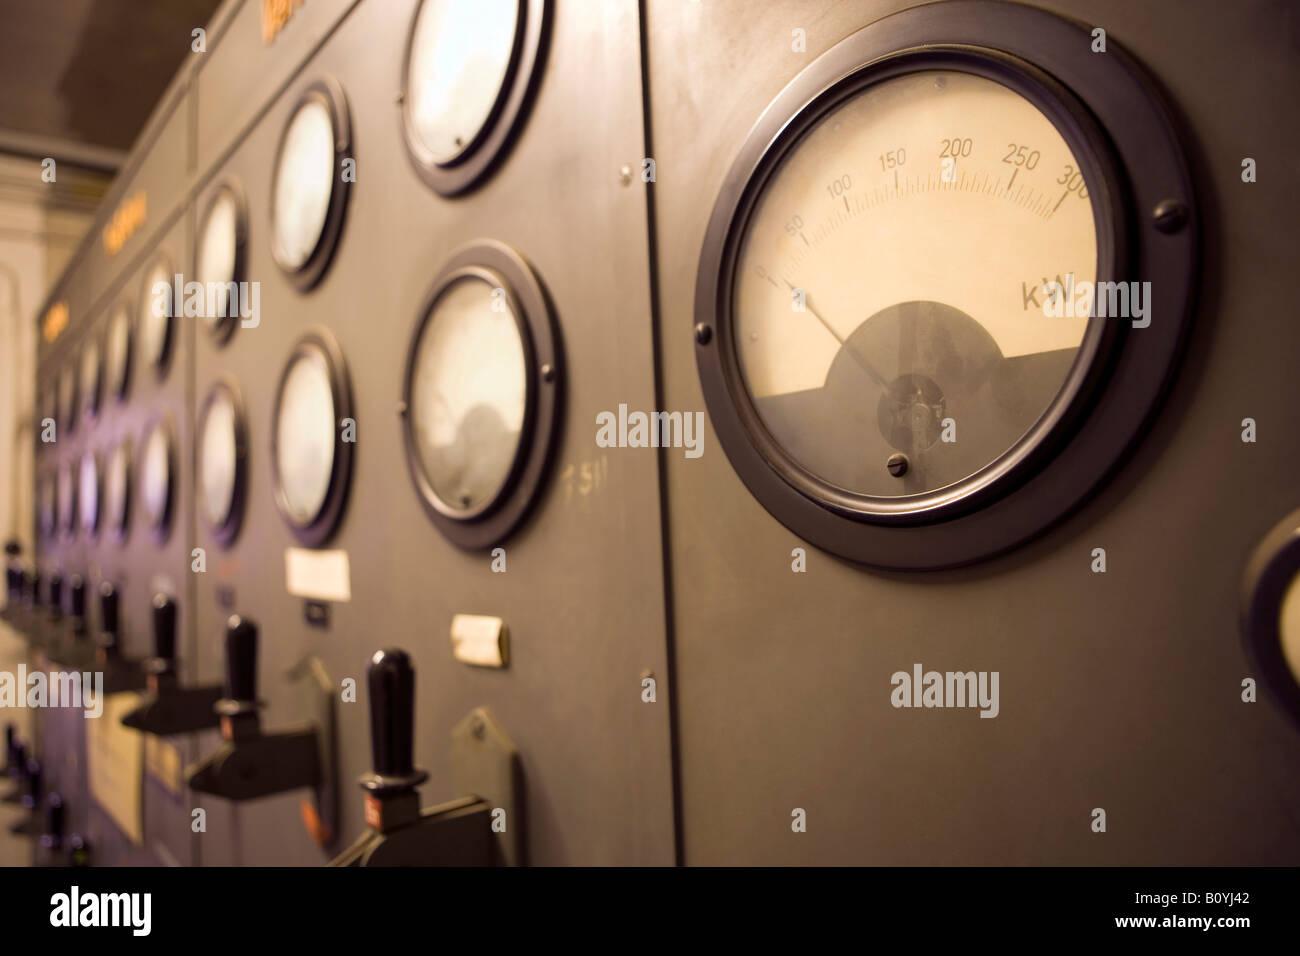 Heating station, indicating instruments - Stock Image